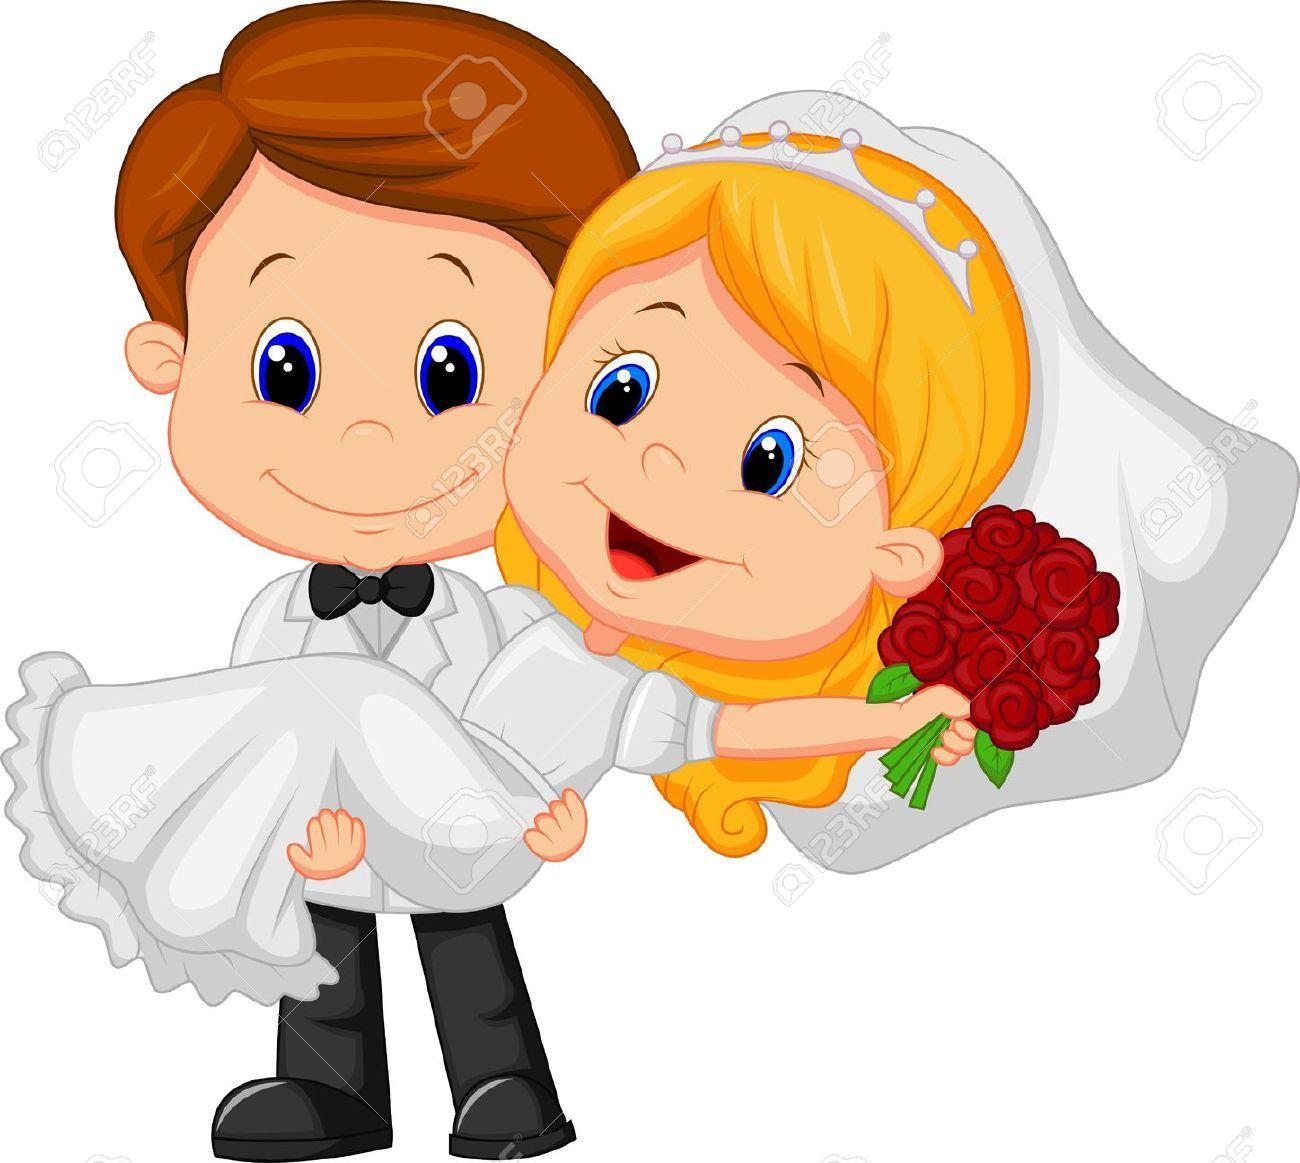 Dibujos de bodas buscar con google bodas y parejitas - Busco hombre para casarme ...